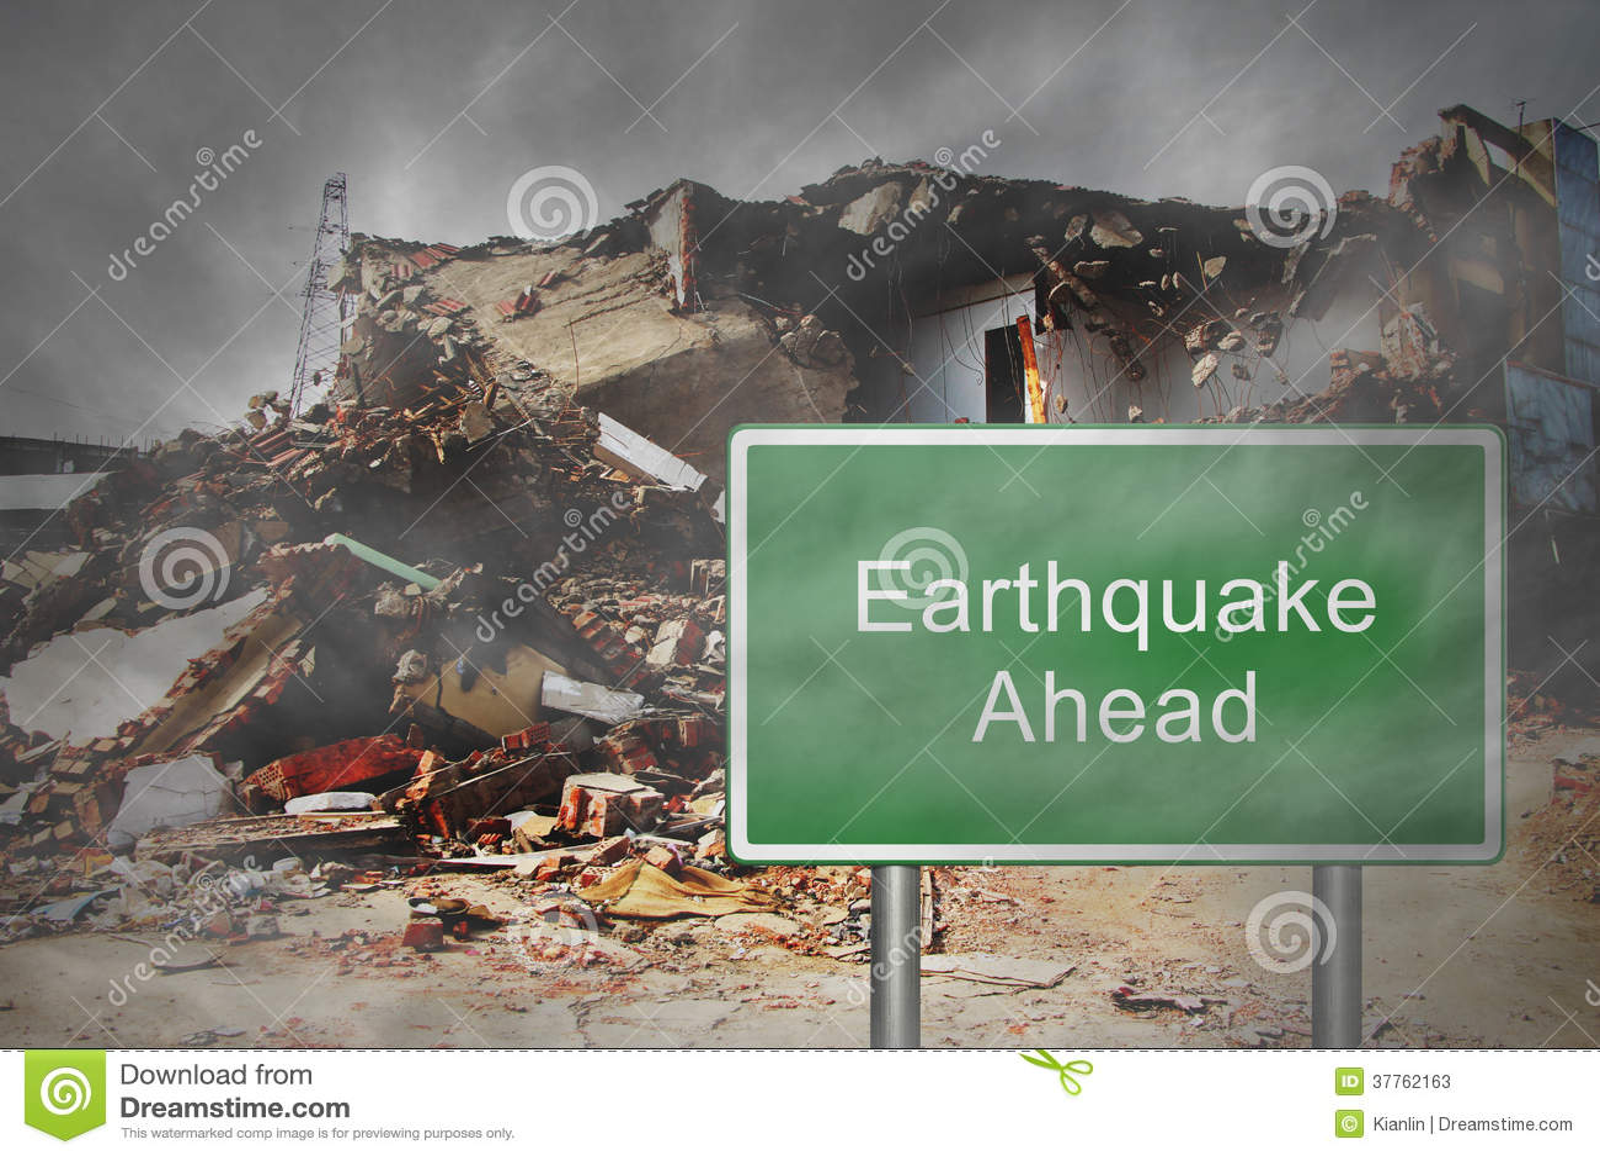 Earthquake Ahead